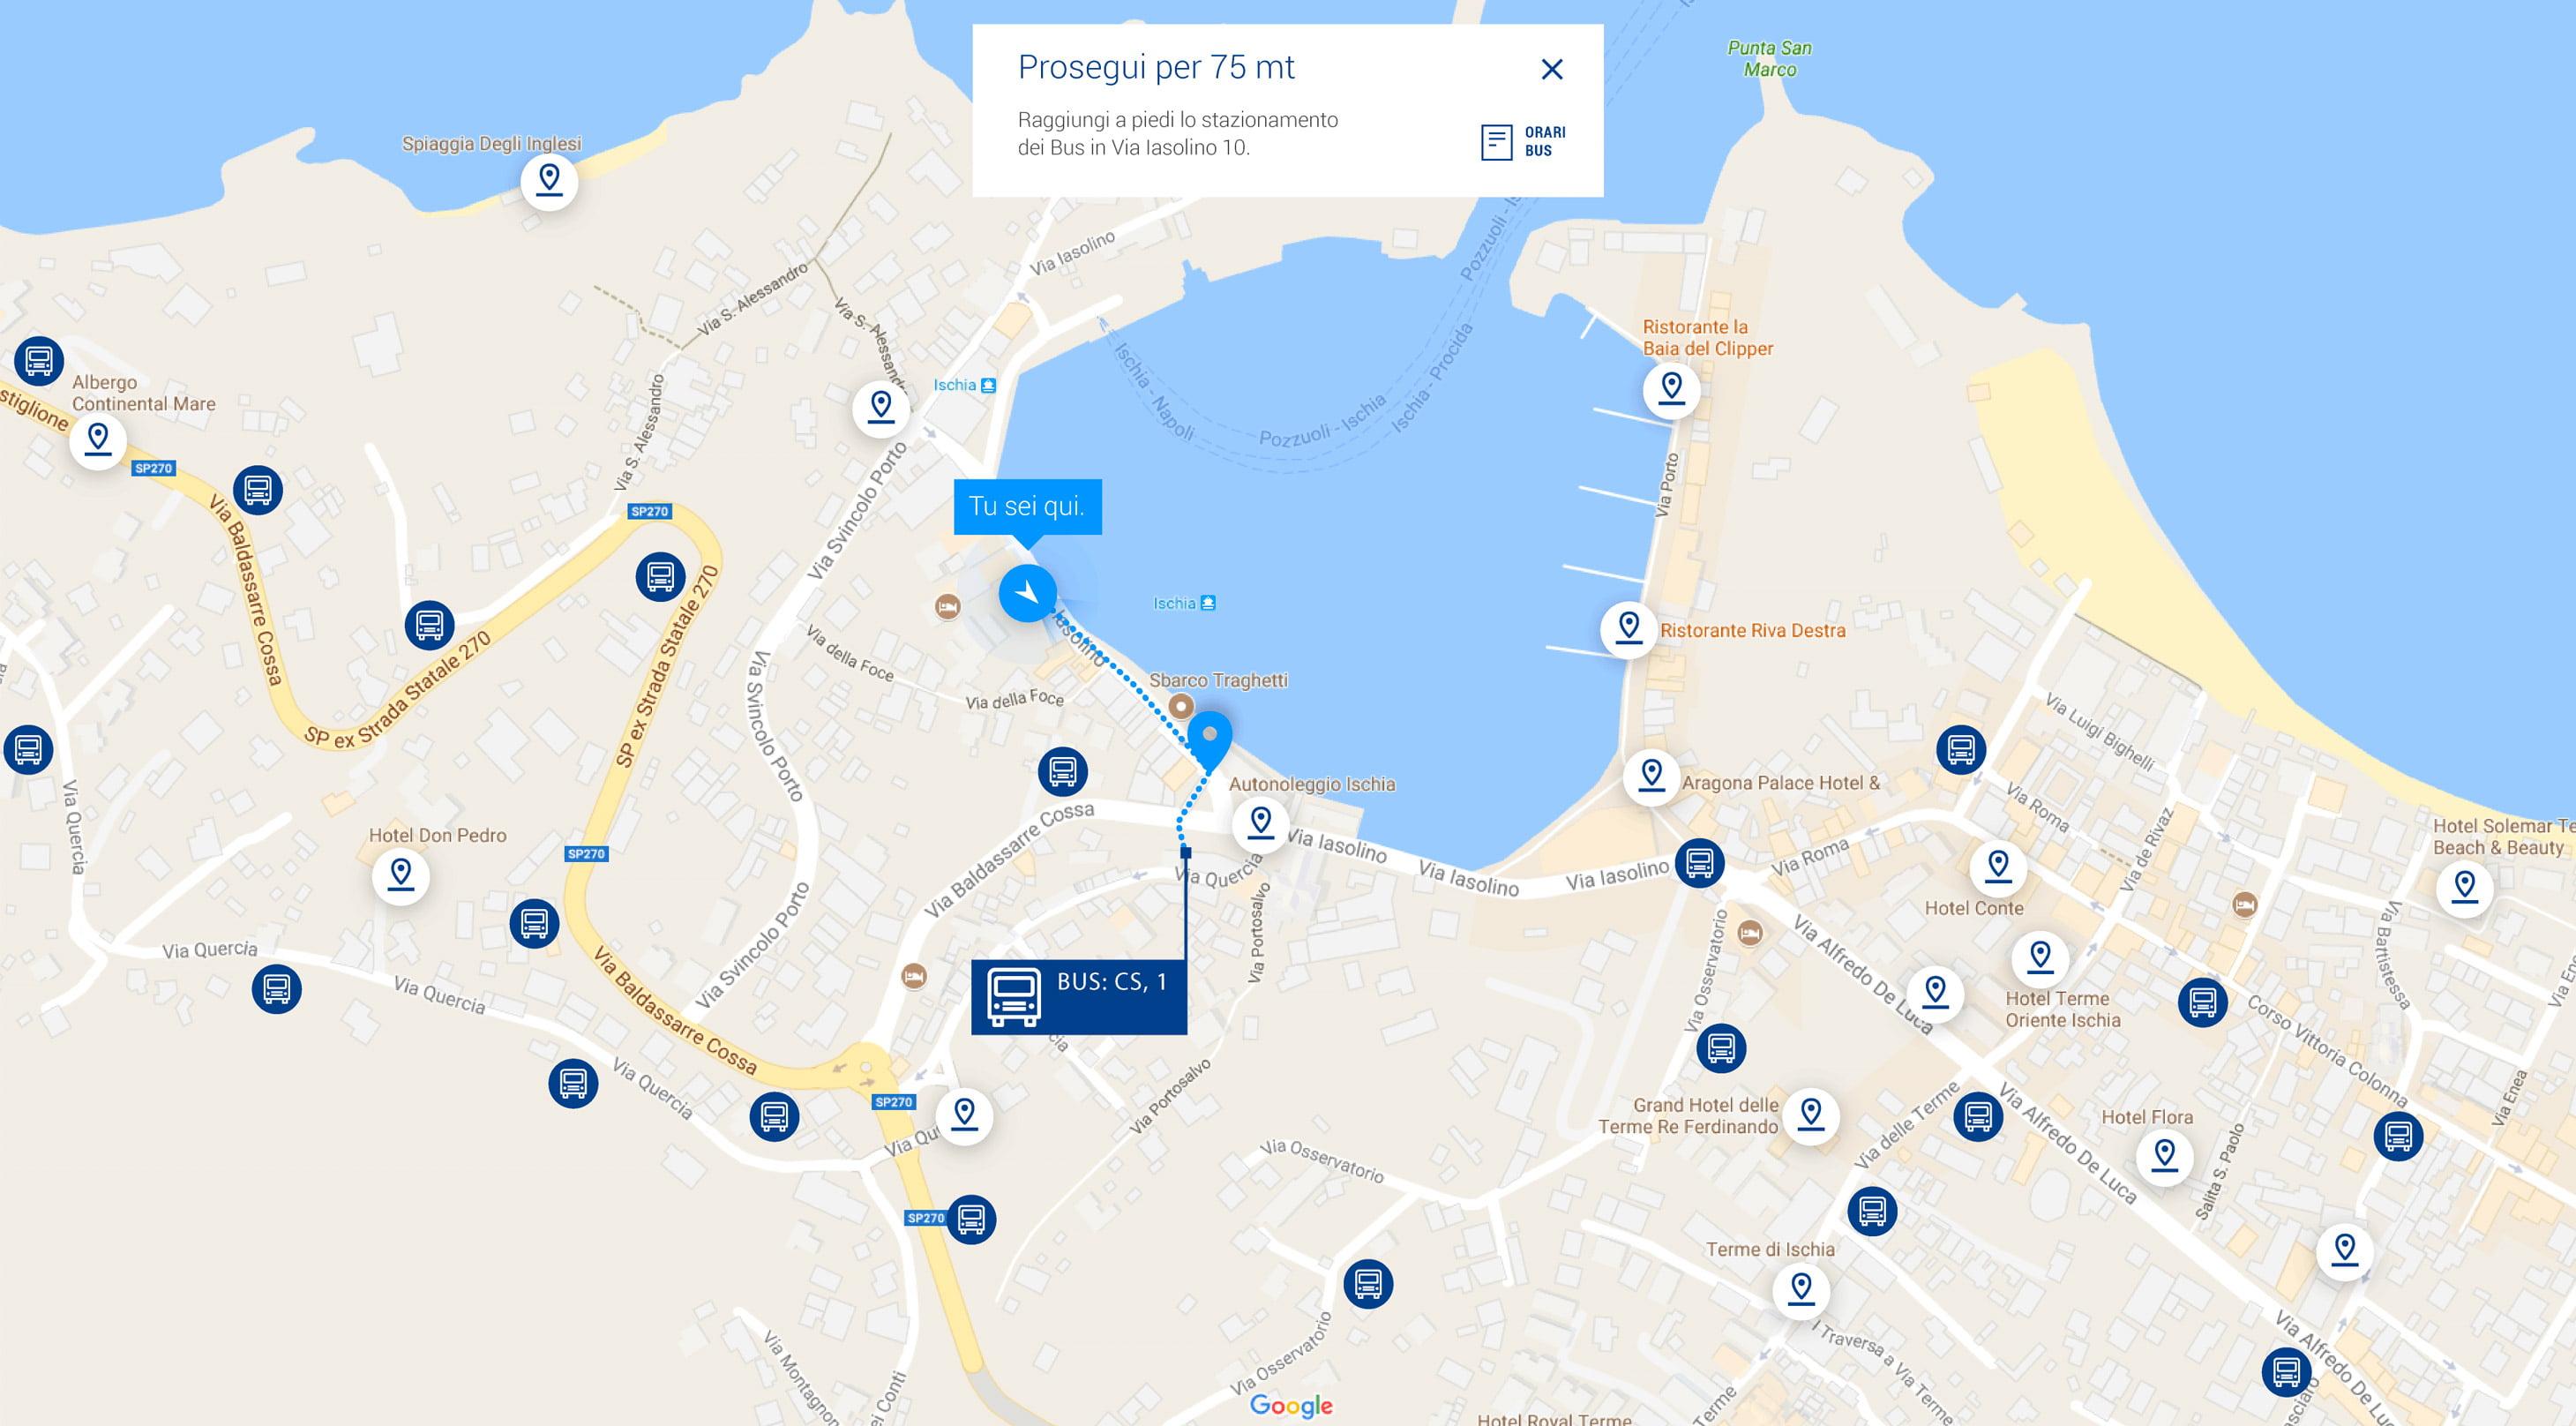 Dotit-Site-Ischia-guide-FullImage-B-min@2x